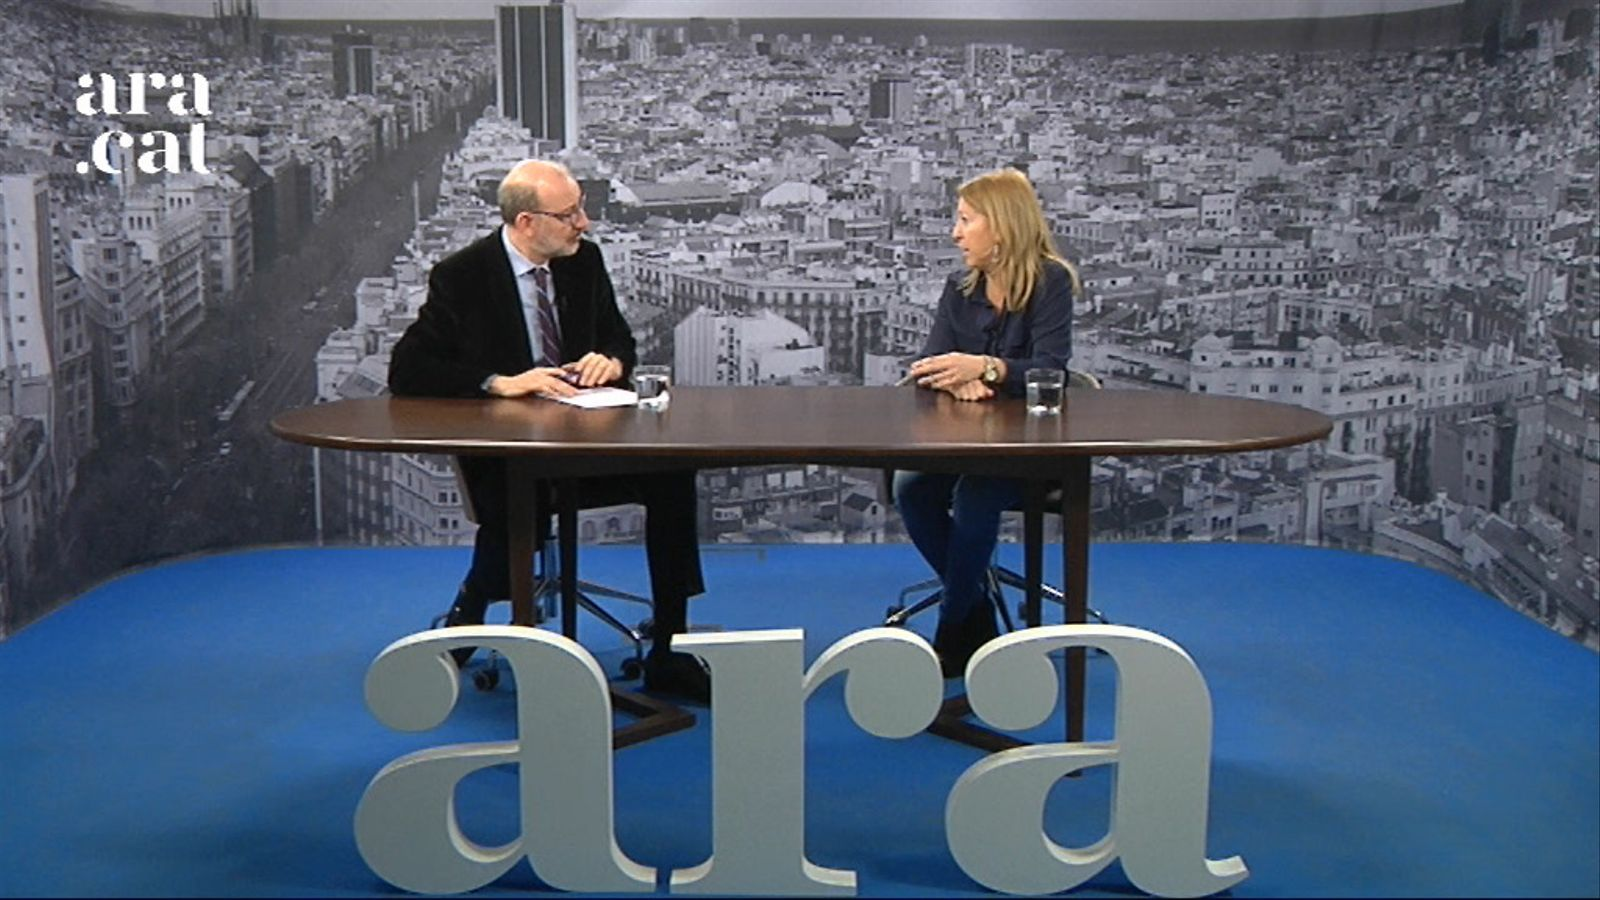 Entrevista d'Antoni Bassas a Neus Munté